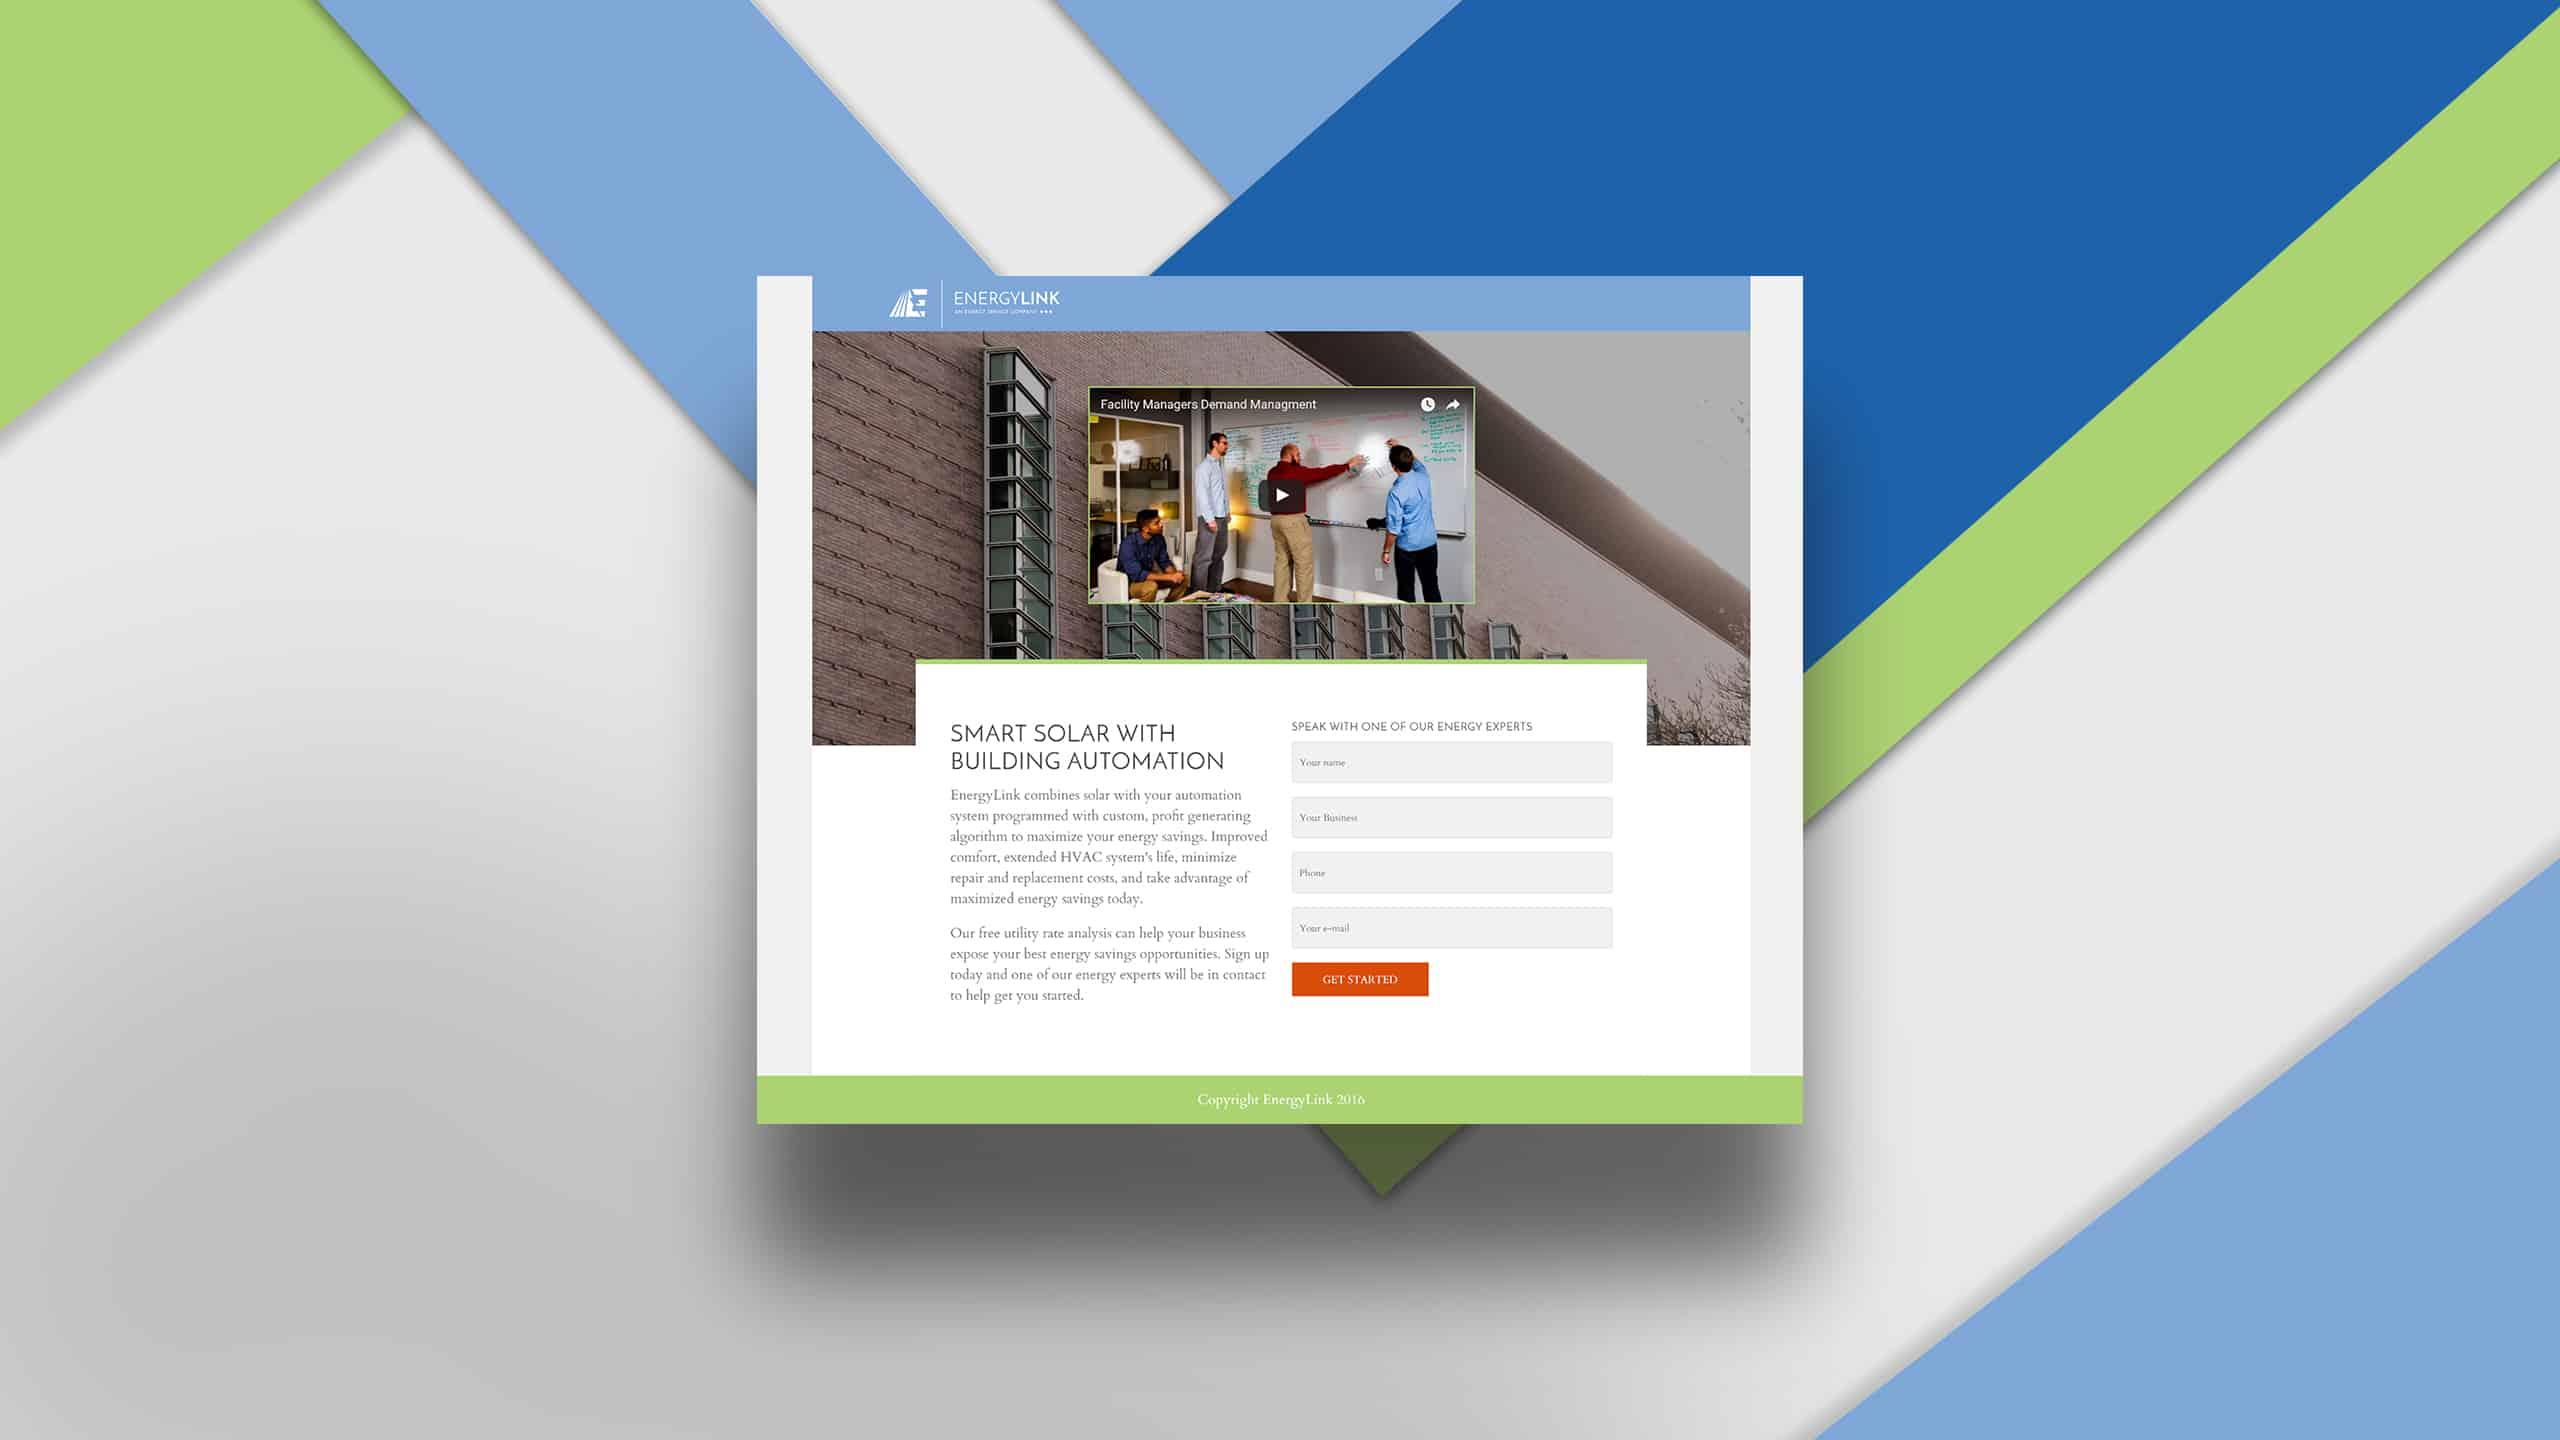 Web design and marketing blog